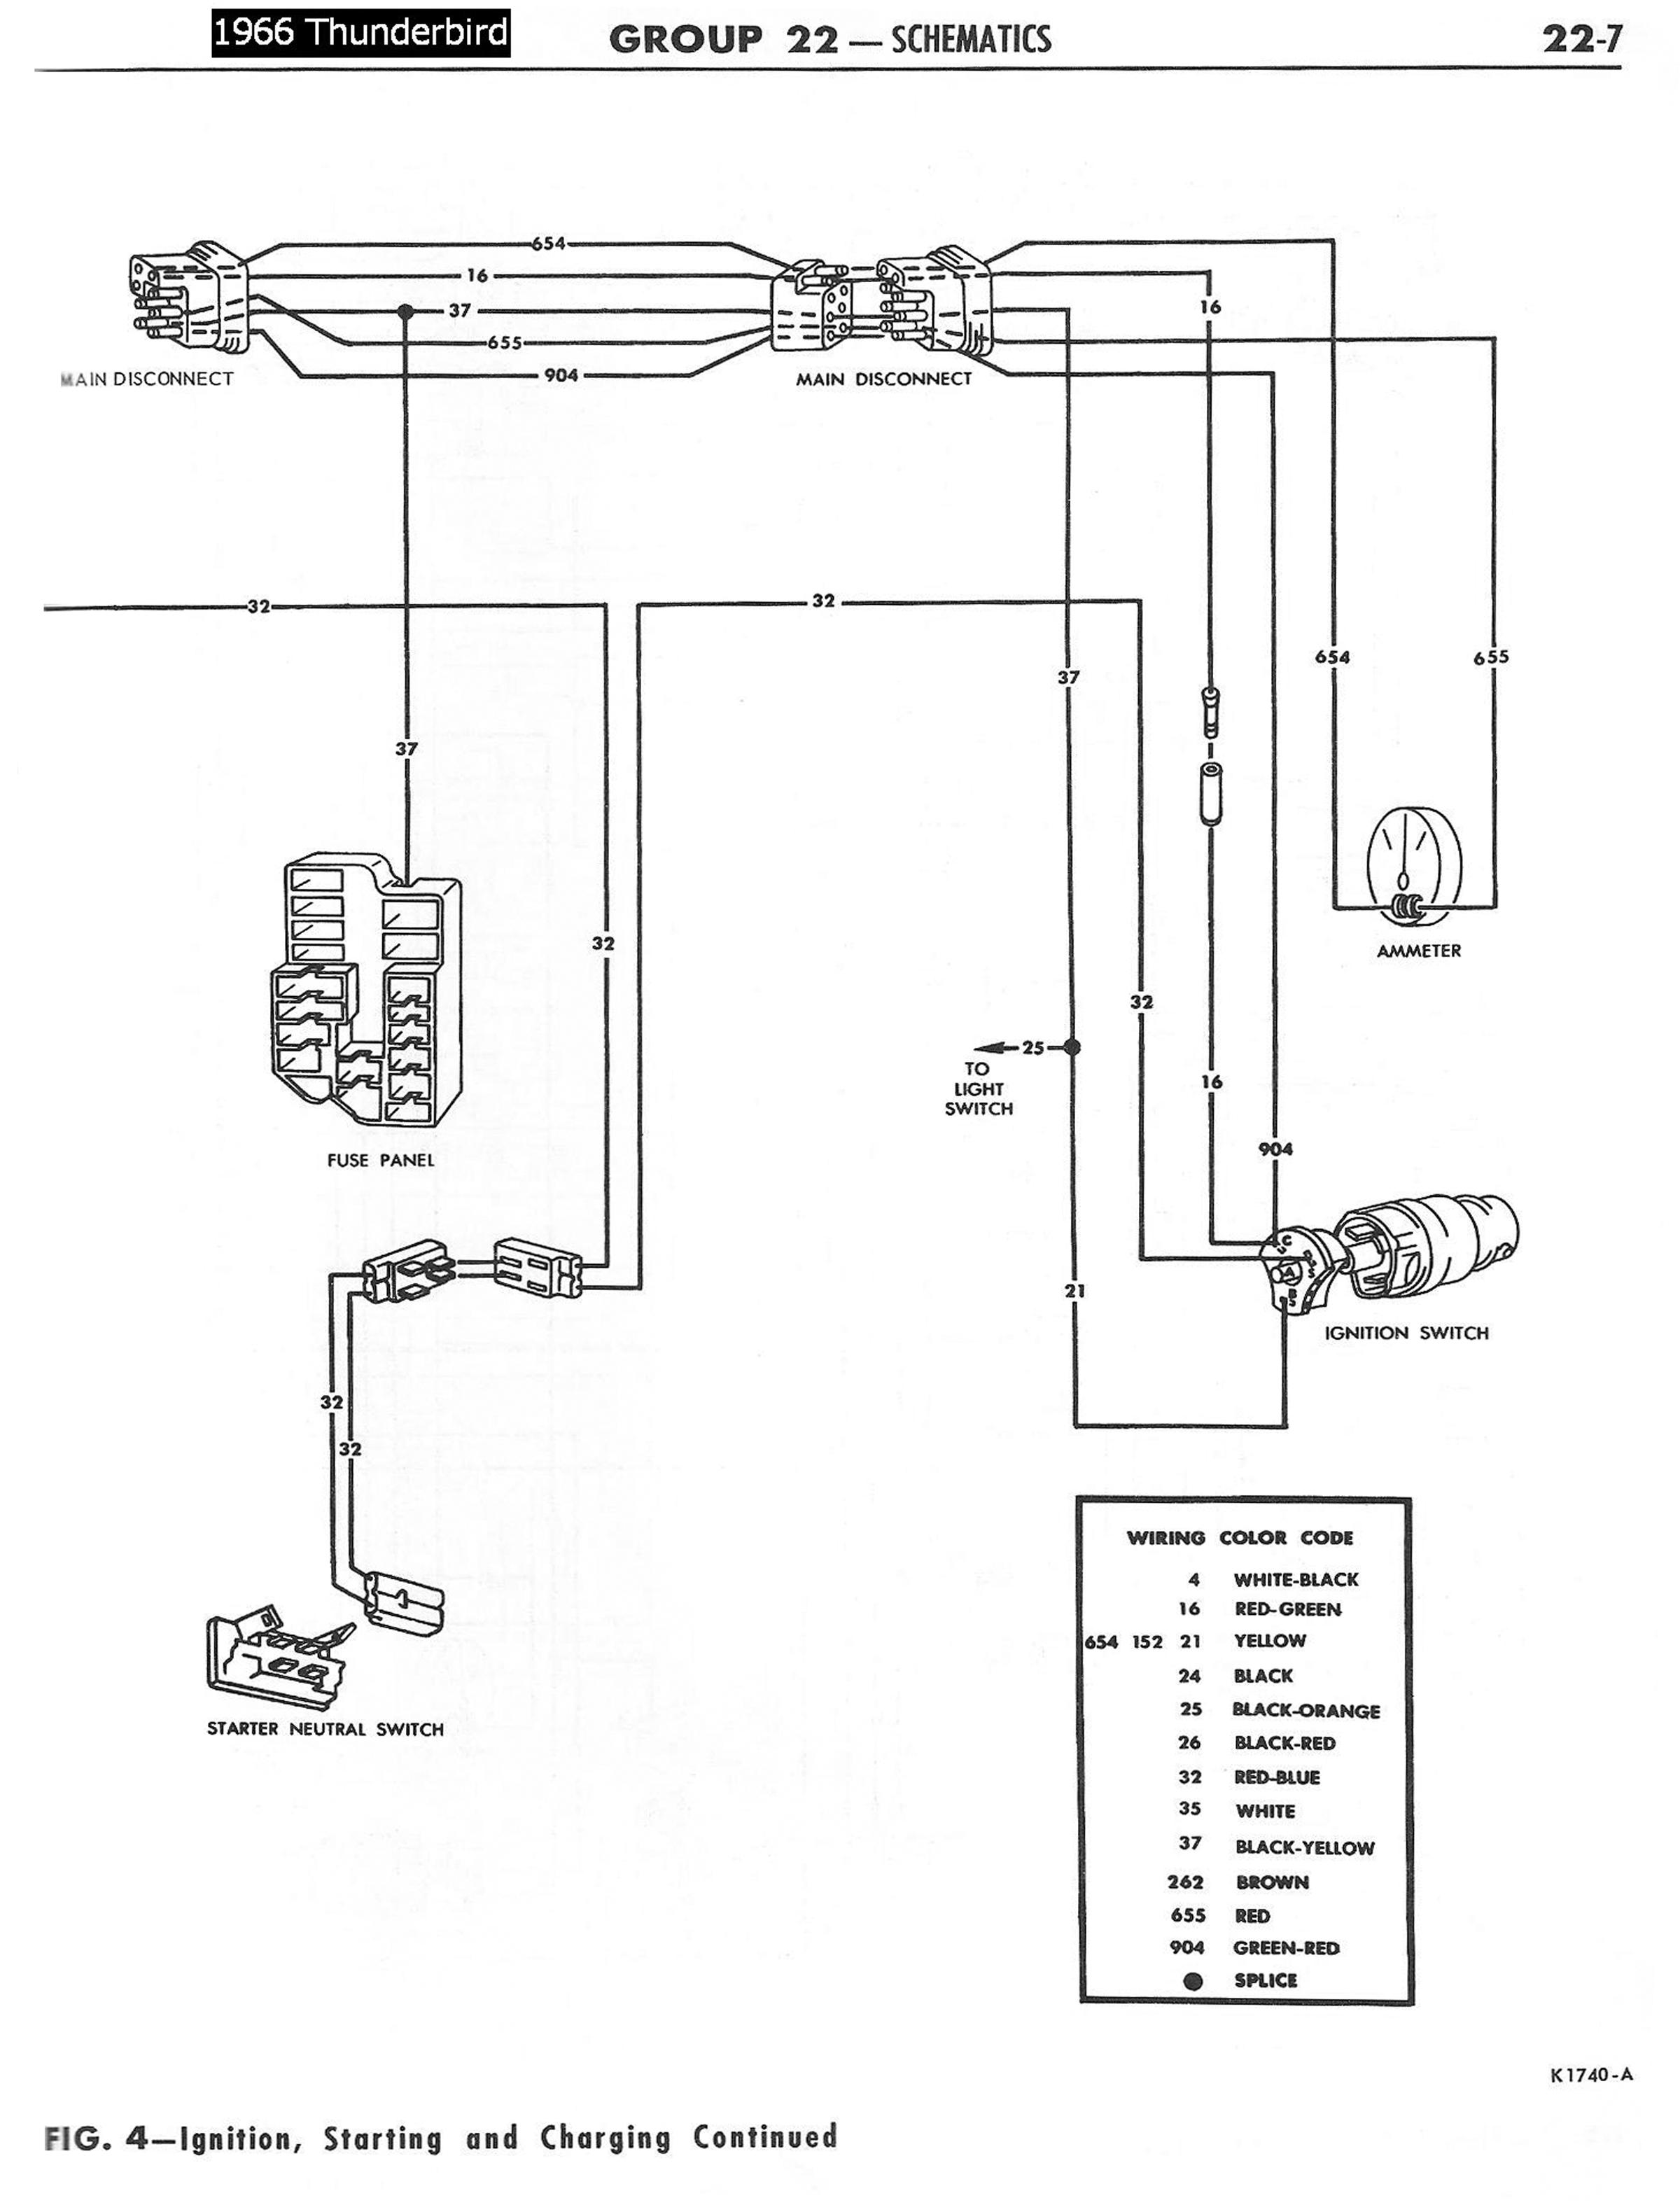 220 electrical wiring diagram shark digestive system 1958-68 ford schematics